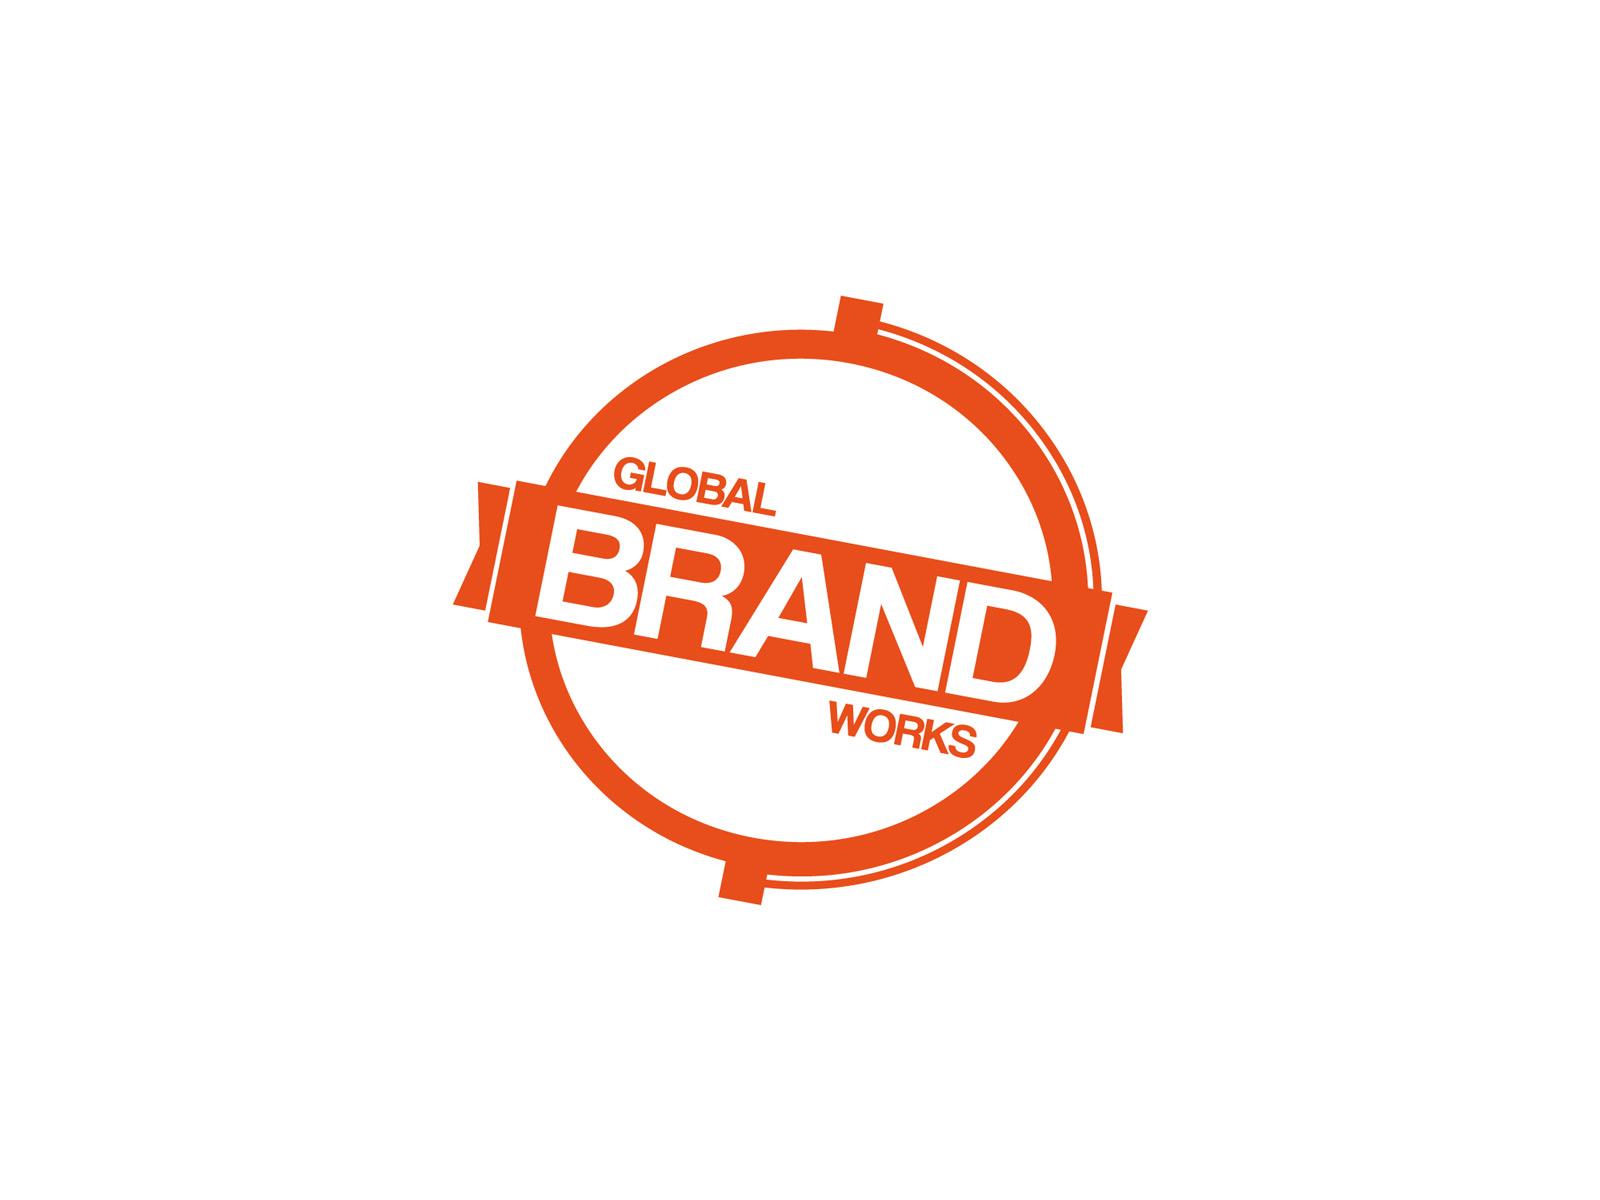 Global brand works logo